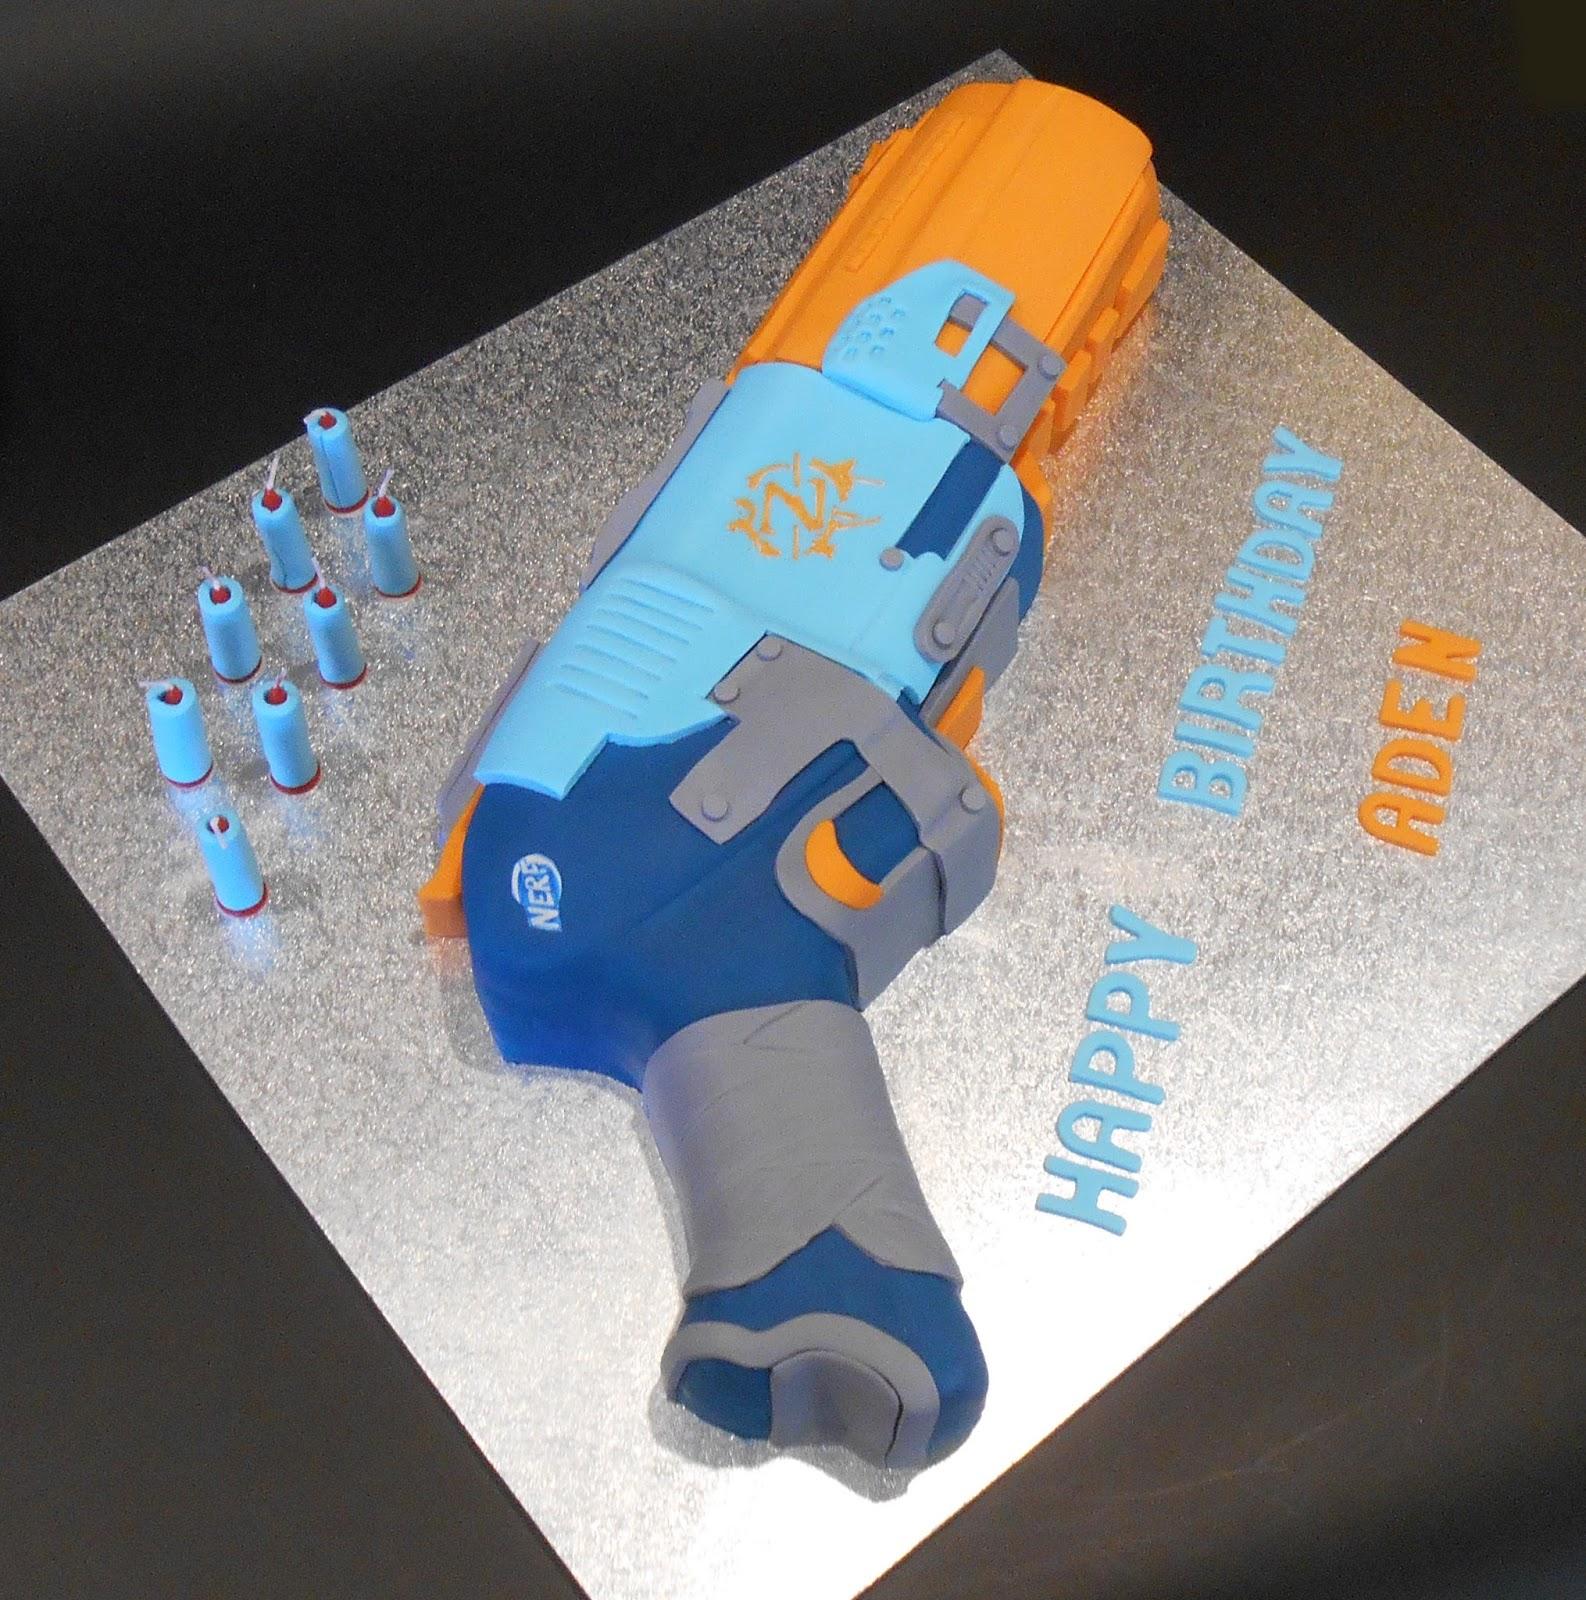 Nadas cakes 3D Nerf Gun Birthday Cake by Nadas Cakes Canberra